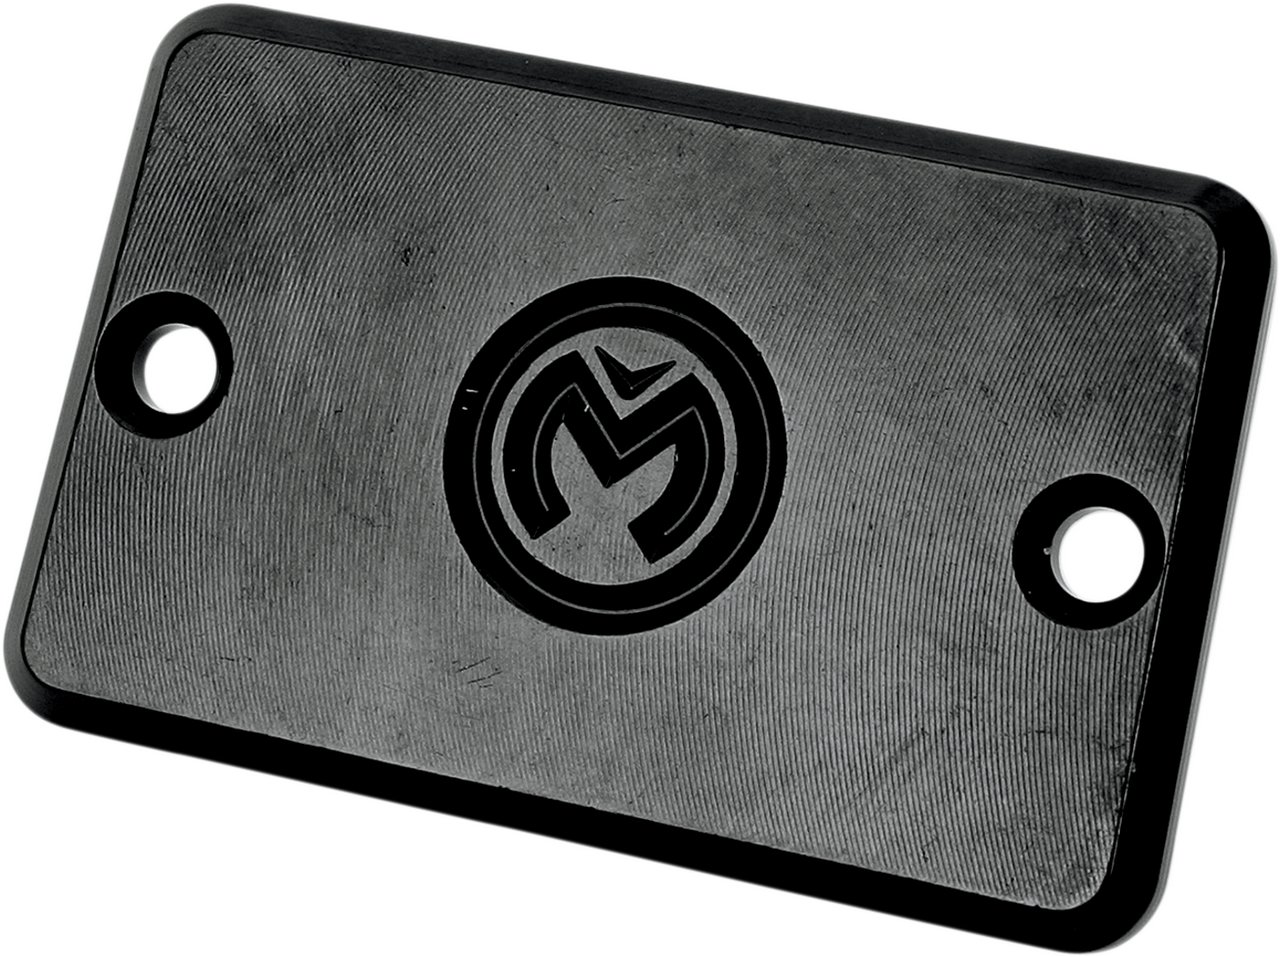 【MOOSE RACING】主缸蓋 [M860-15] - 「Webike-摩托百貨」